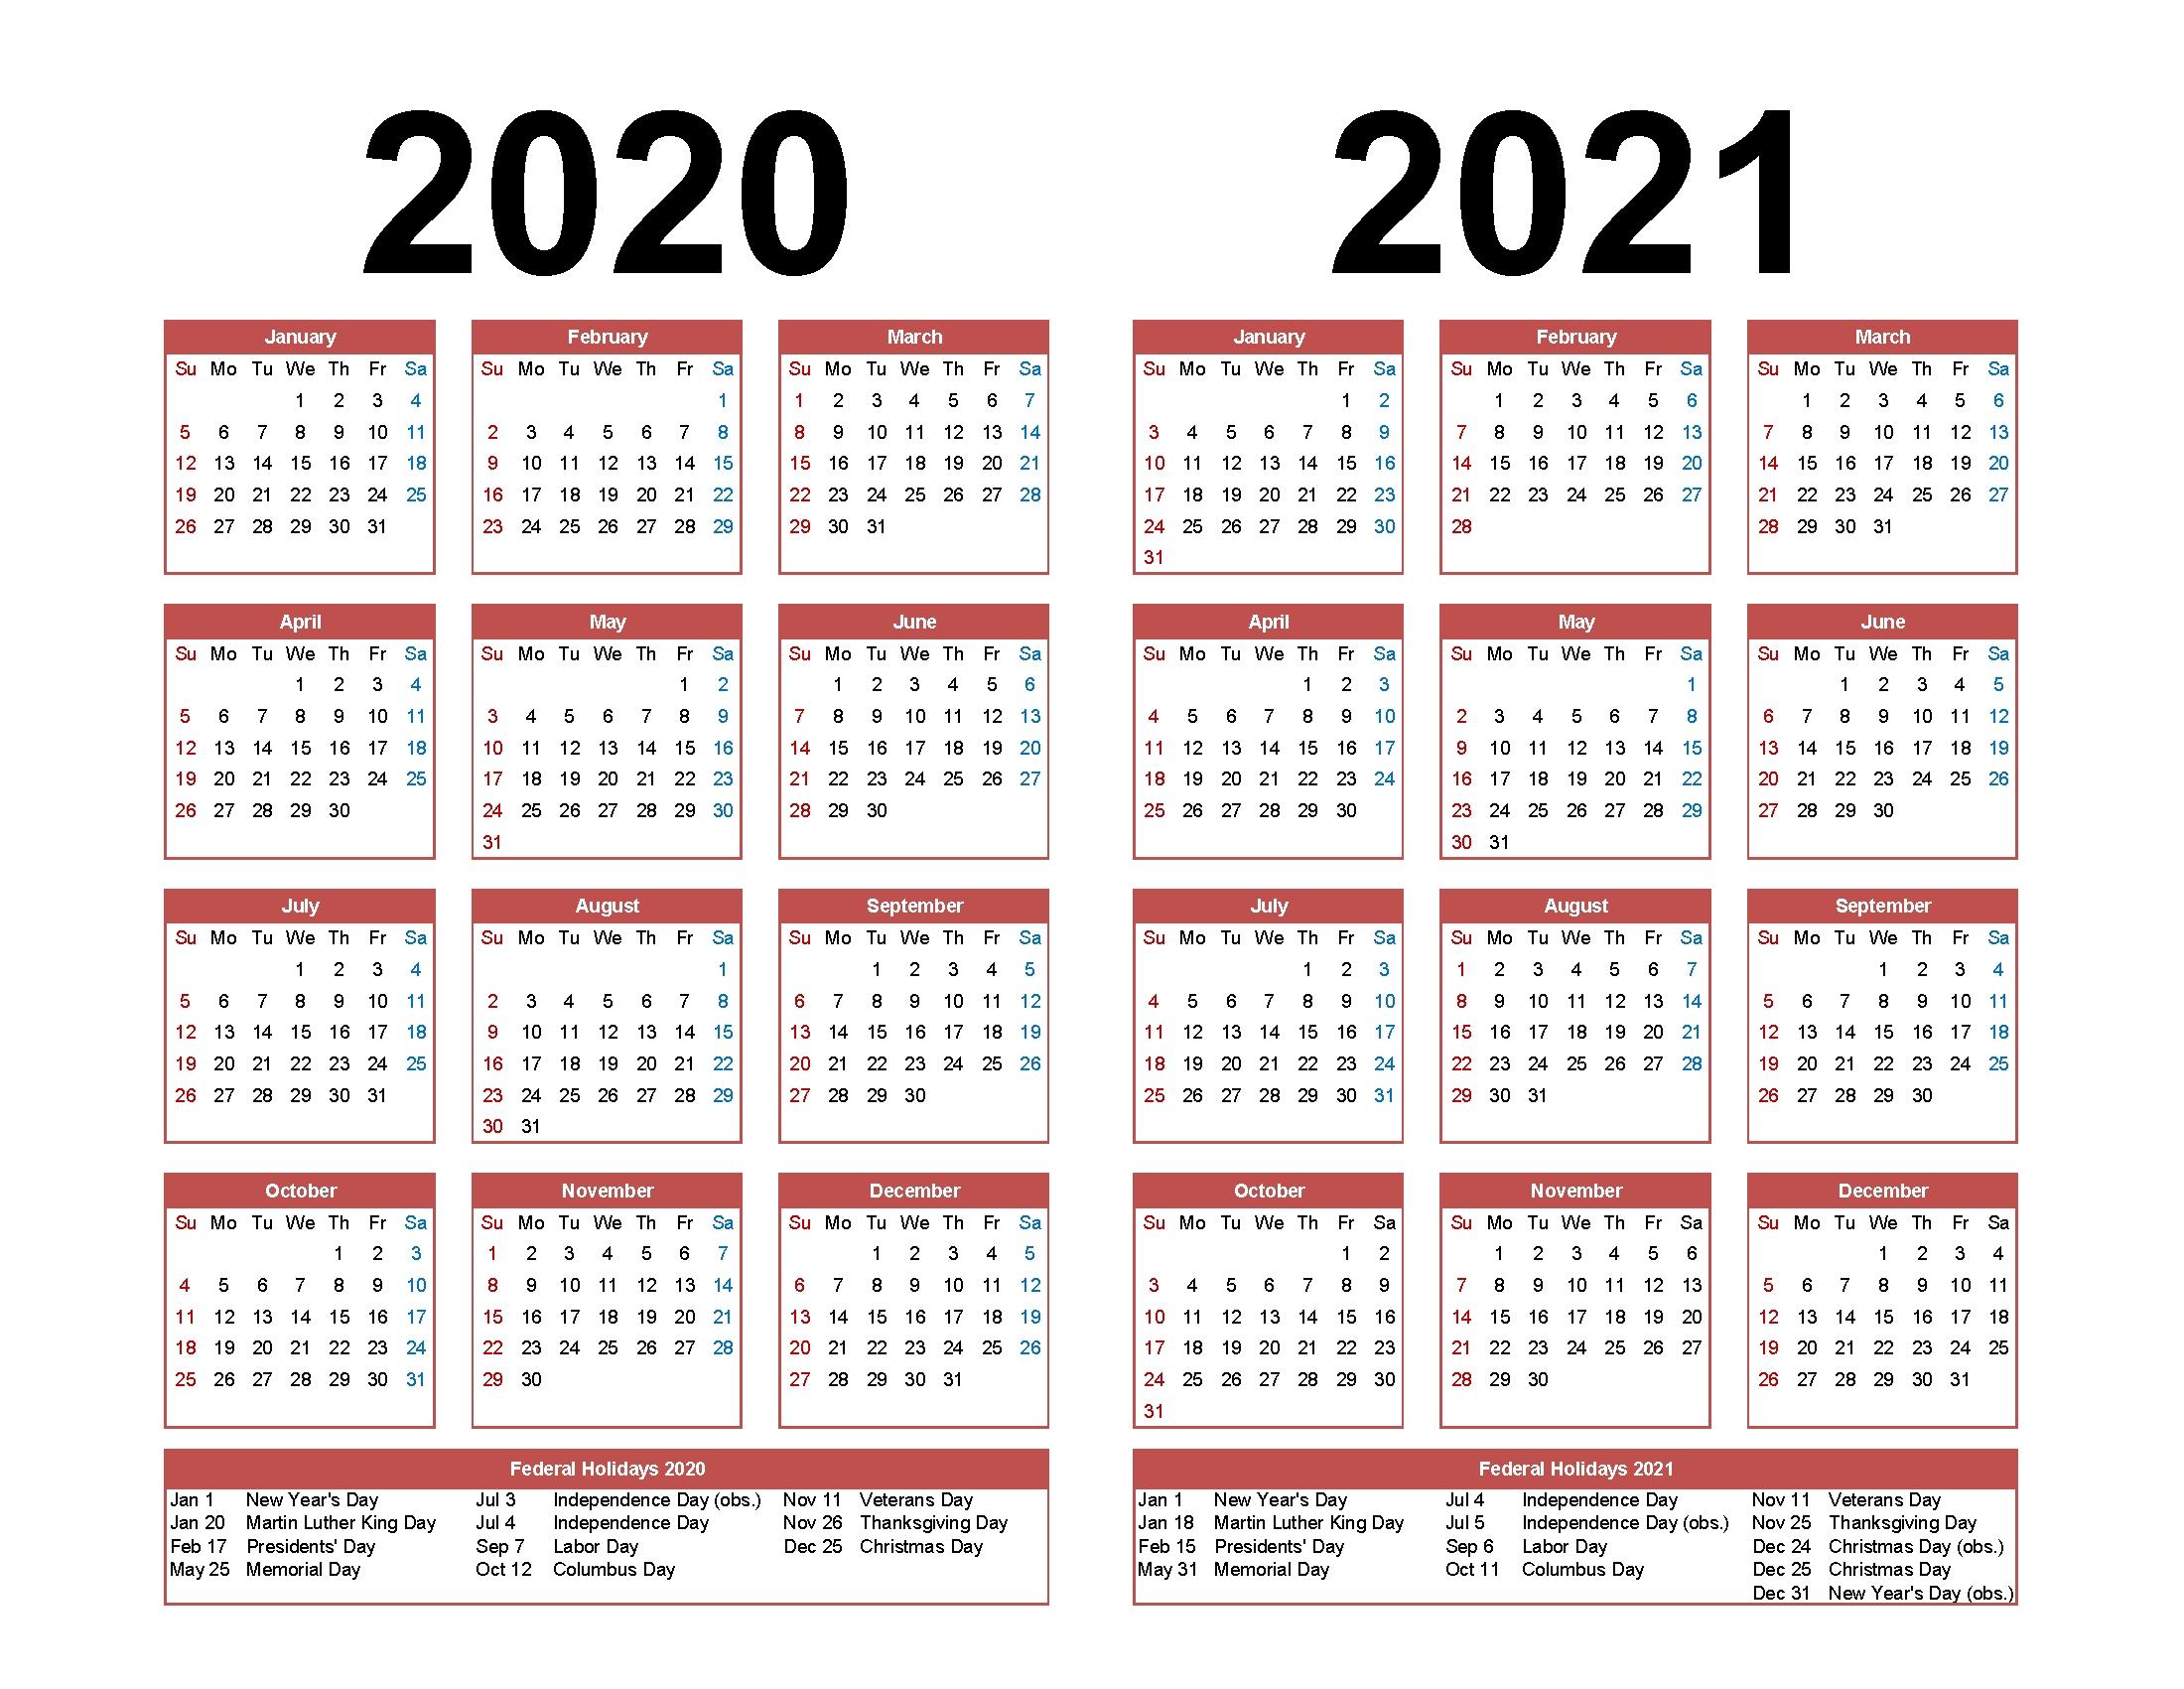 4 Year Calendar 2020 To 2021 | Month Calendar Printable